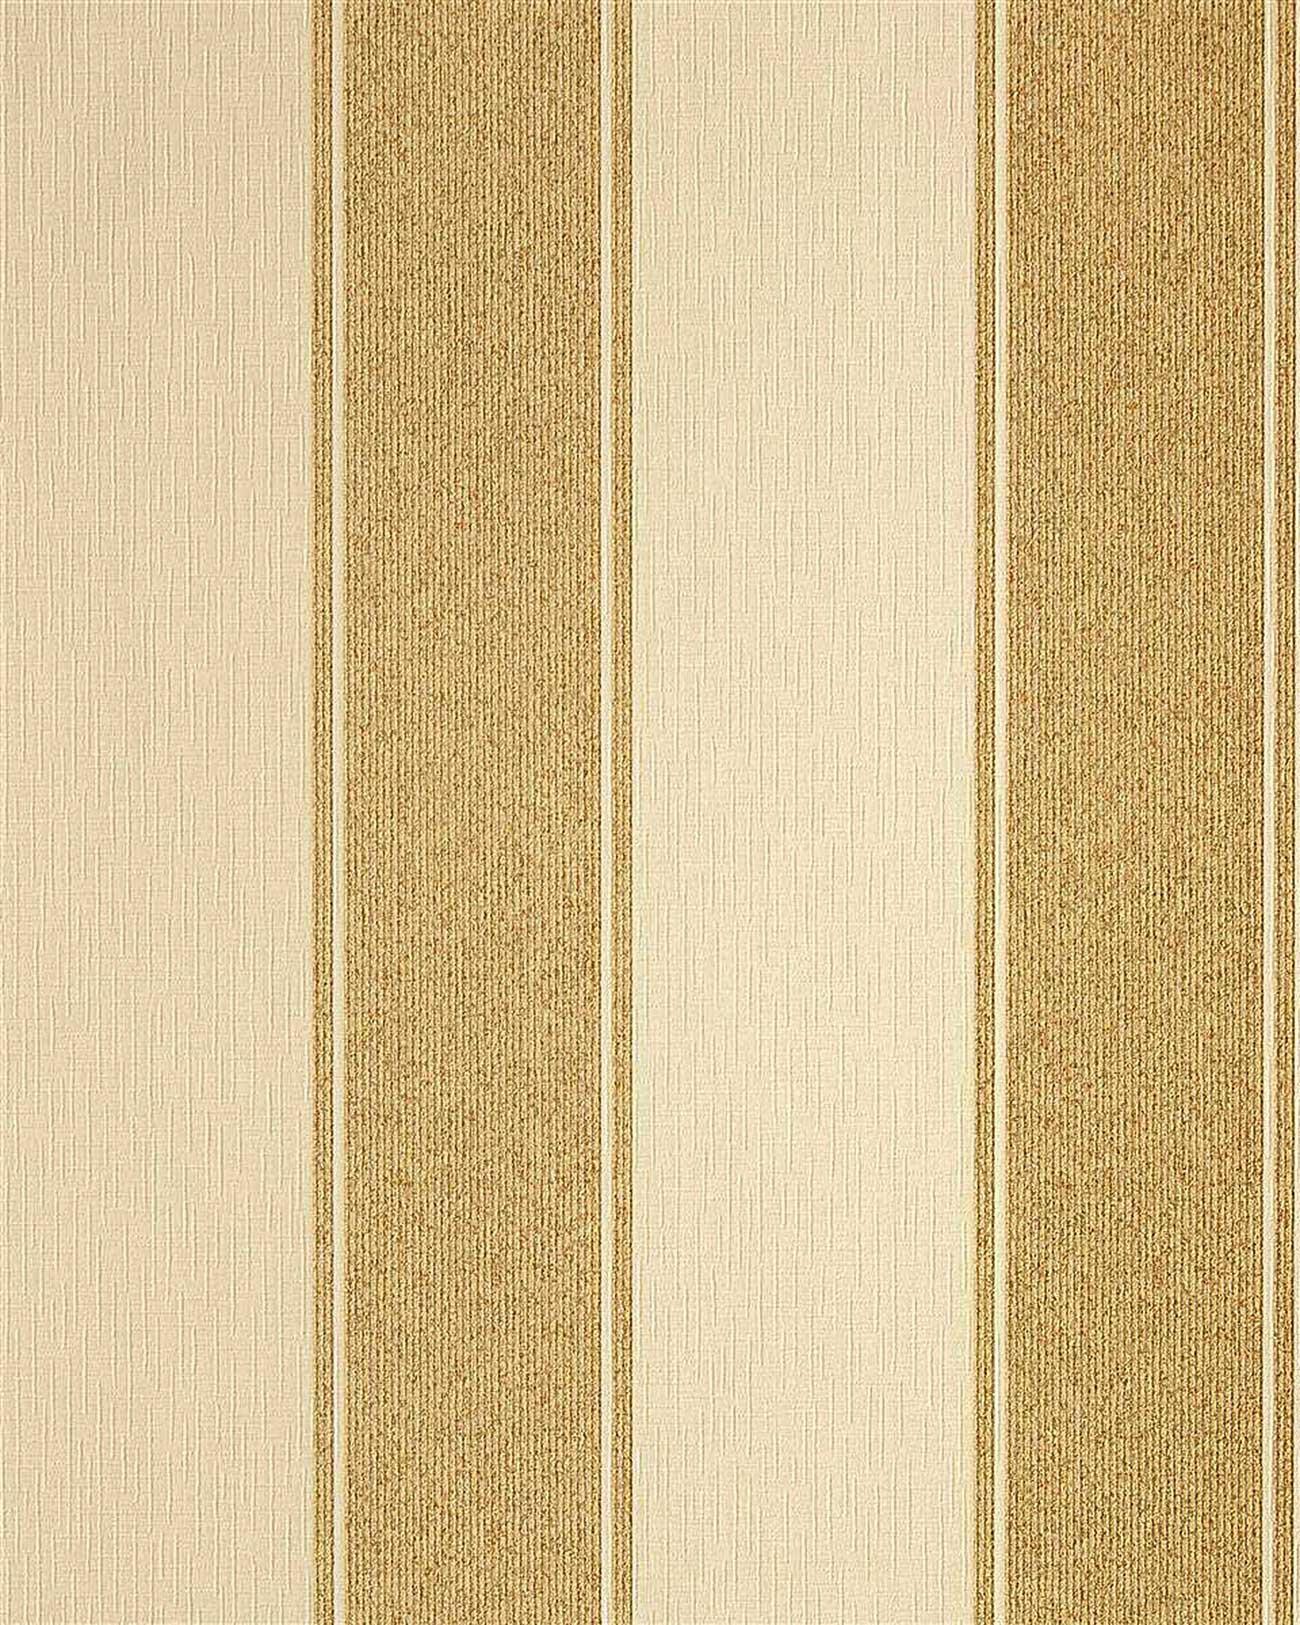 30 luxury heavyweight arthouse stripe wallpaper cream gold platin grey 1300x1625